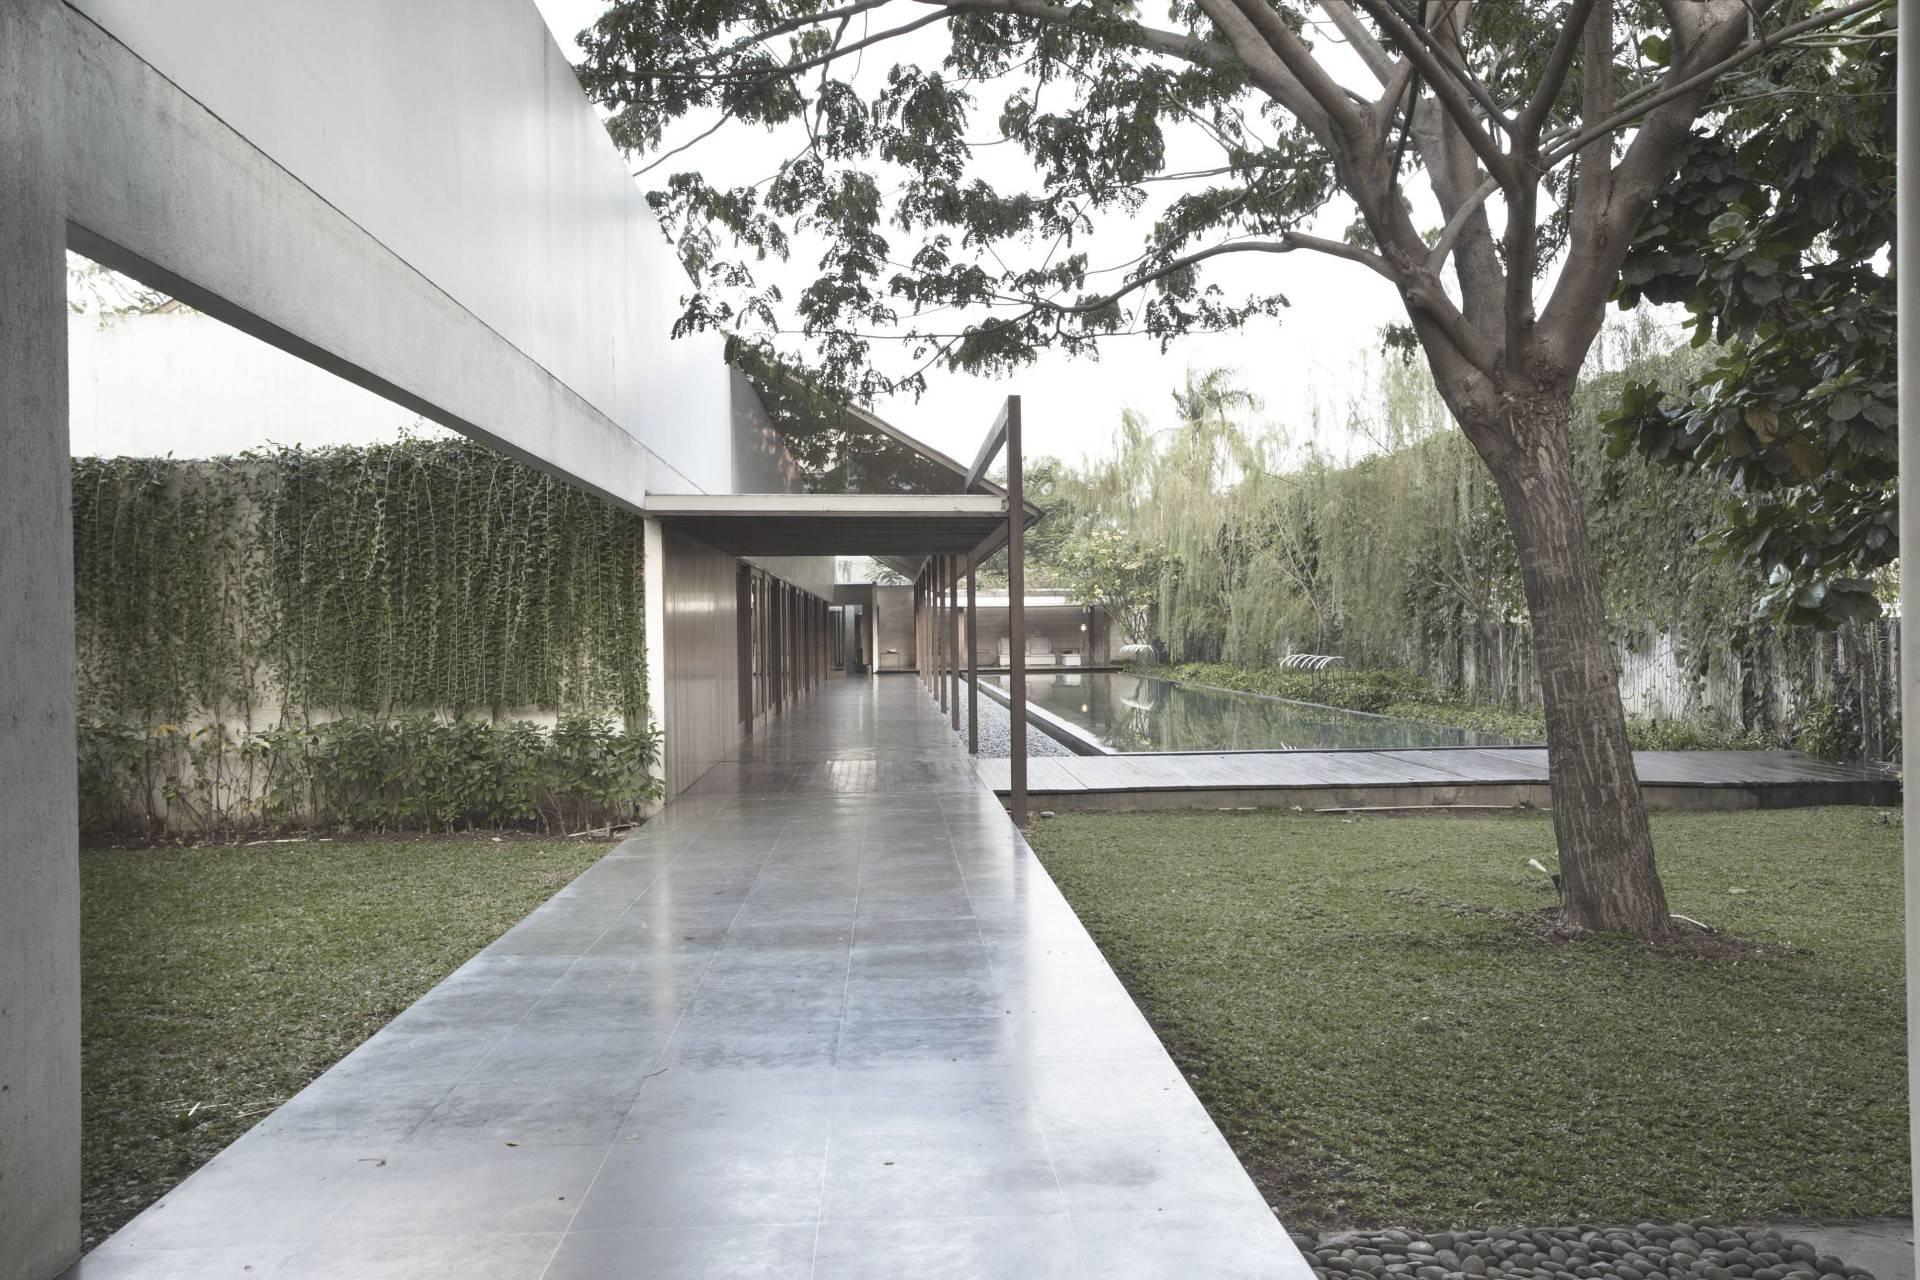 Antony Liu + Ferry Ridwan / Studio Tonton Ew House Serpong, Tangerang Serpong, Tangerang Ew House - Courtyard Modern  8095